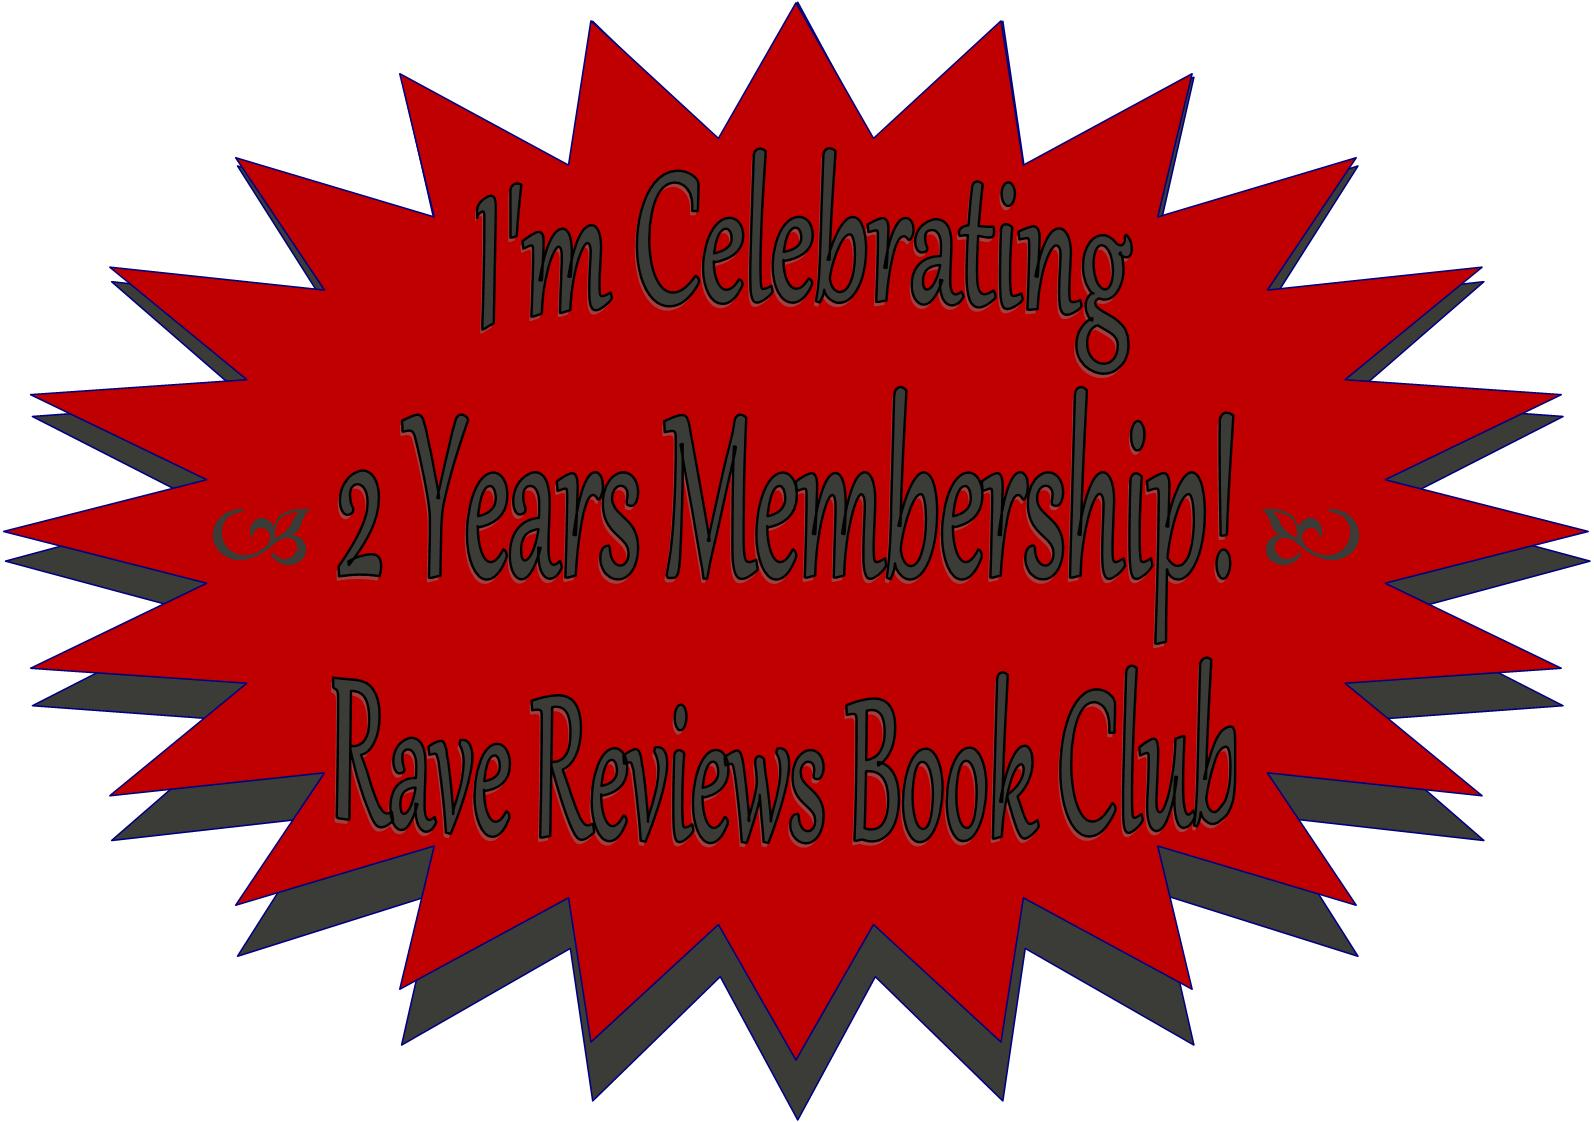 Proud RRBC Member